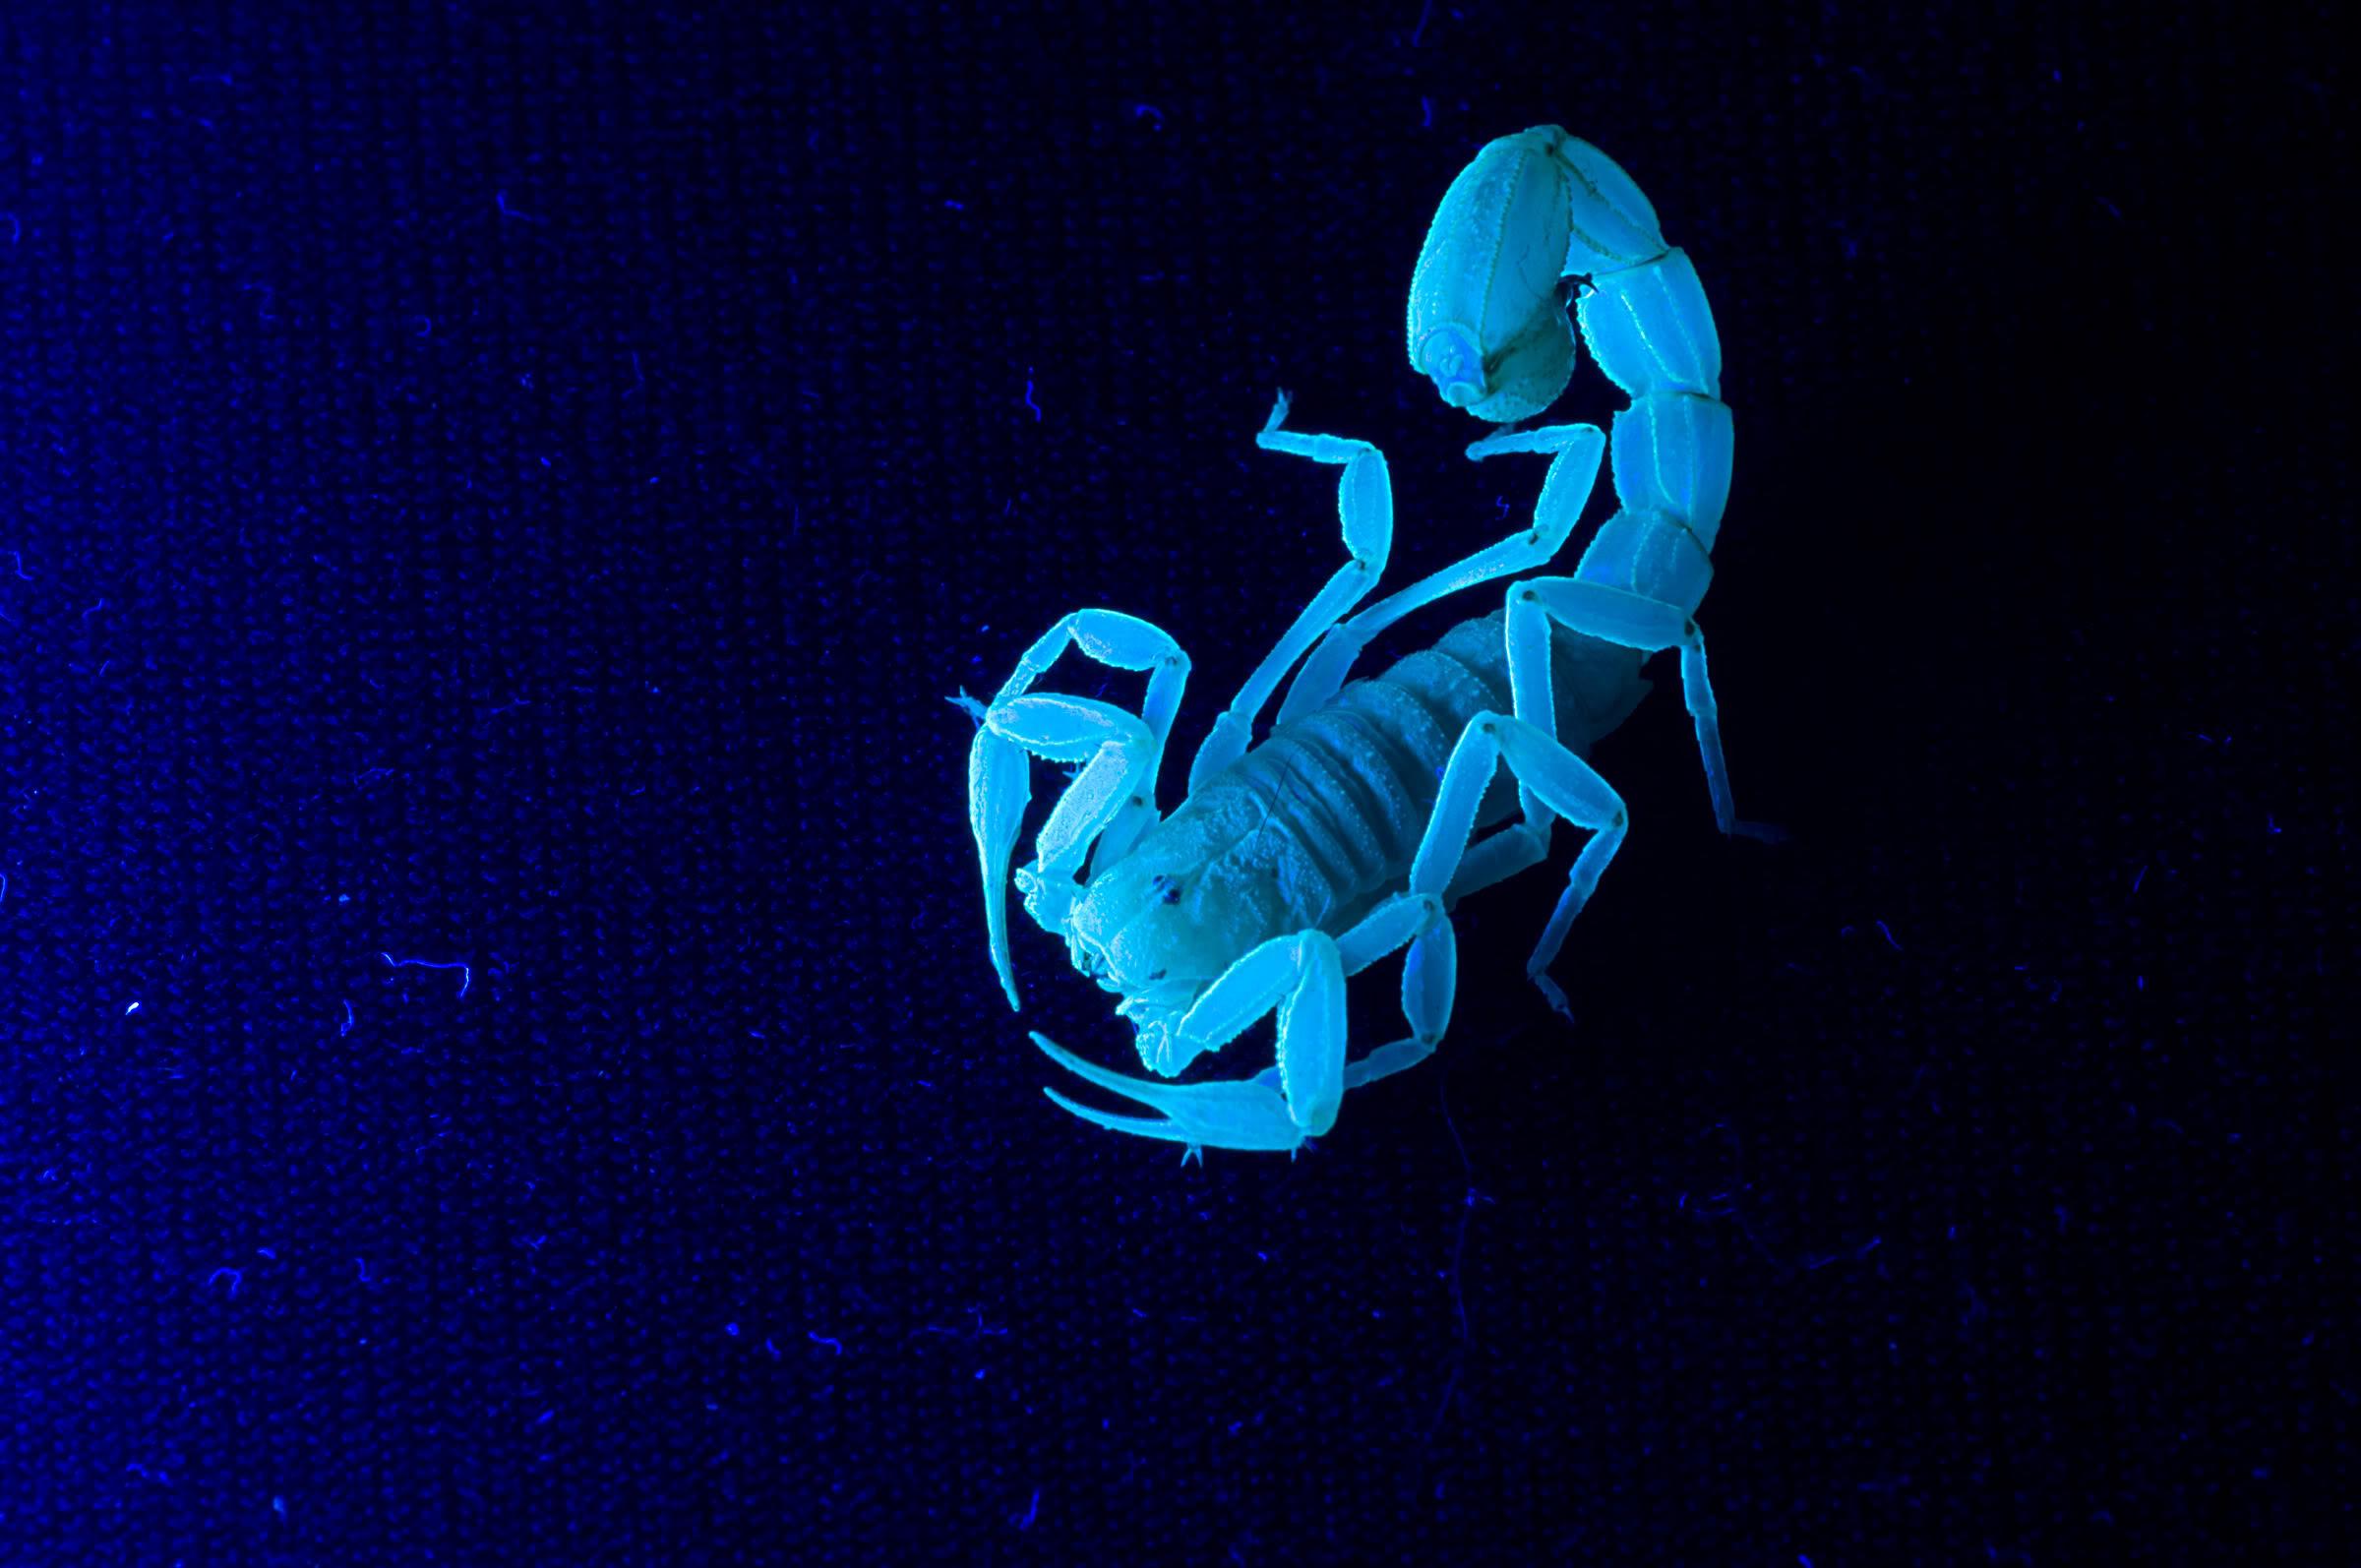 Scorpion Abstract Wallpapers Photo   Bhstormcom 2400x1594